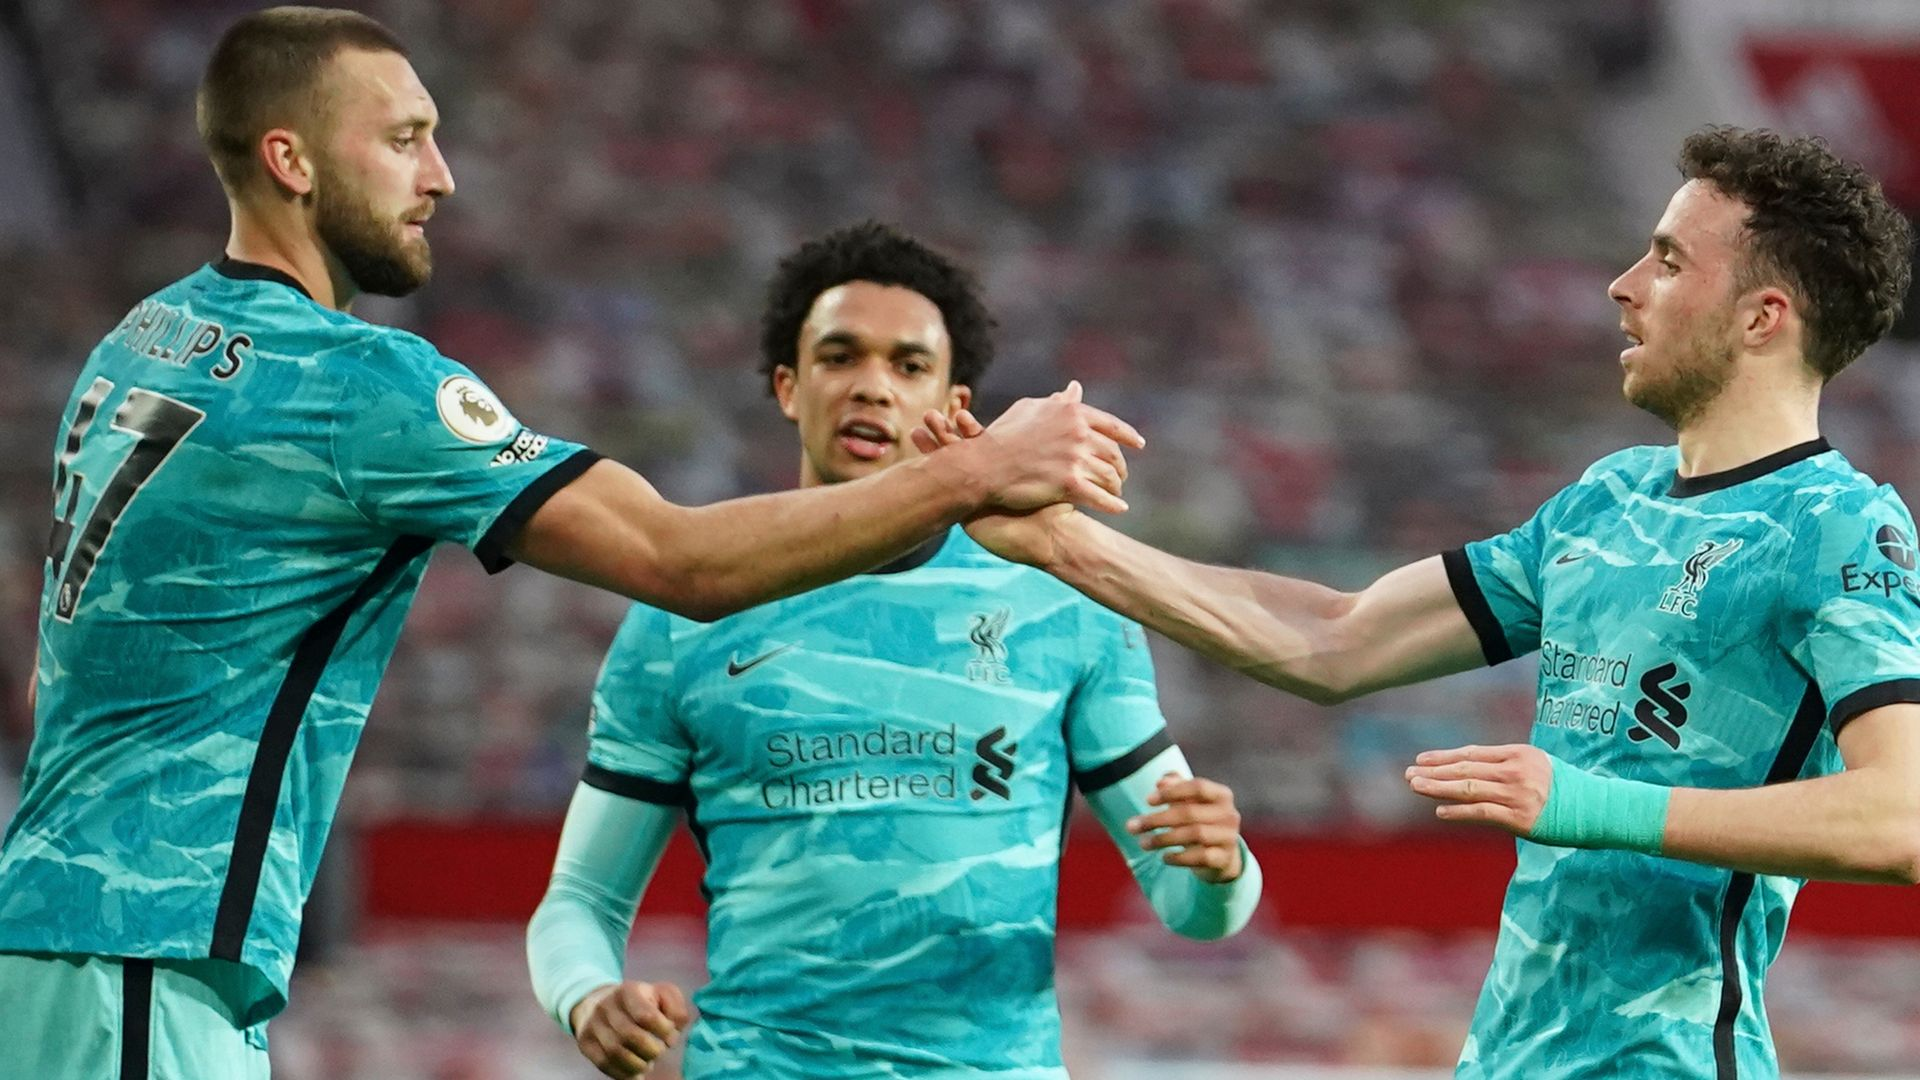 Man Utd-Liverpool ratings: TAA, Firmino shine